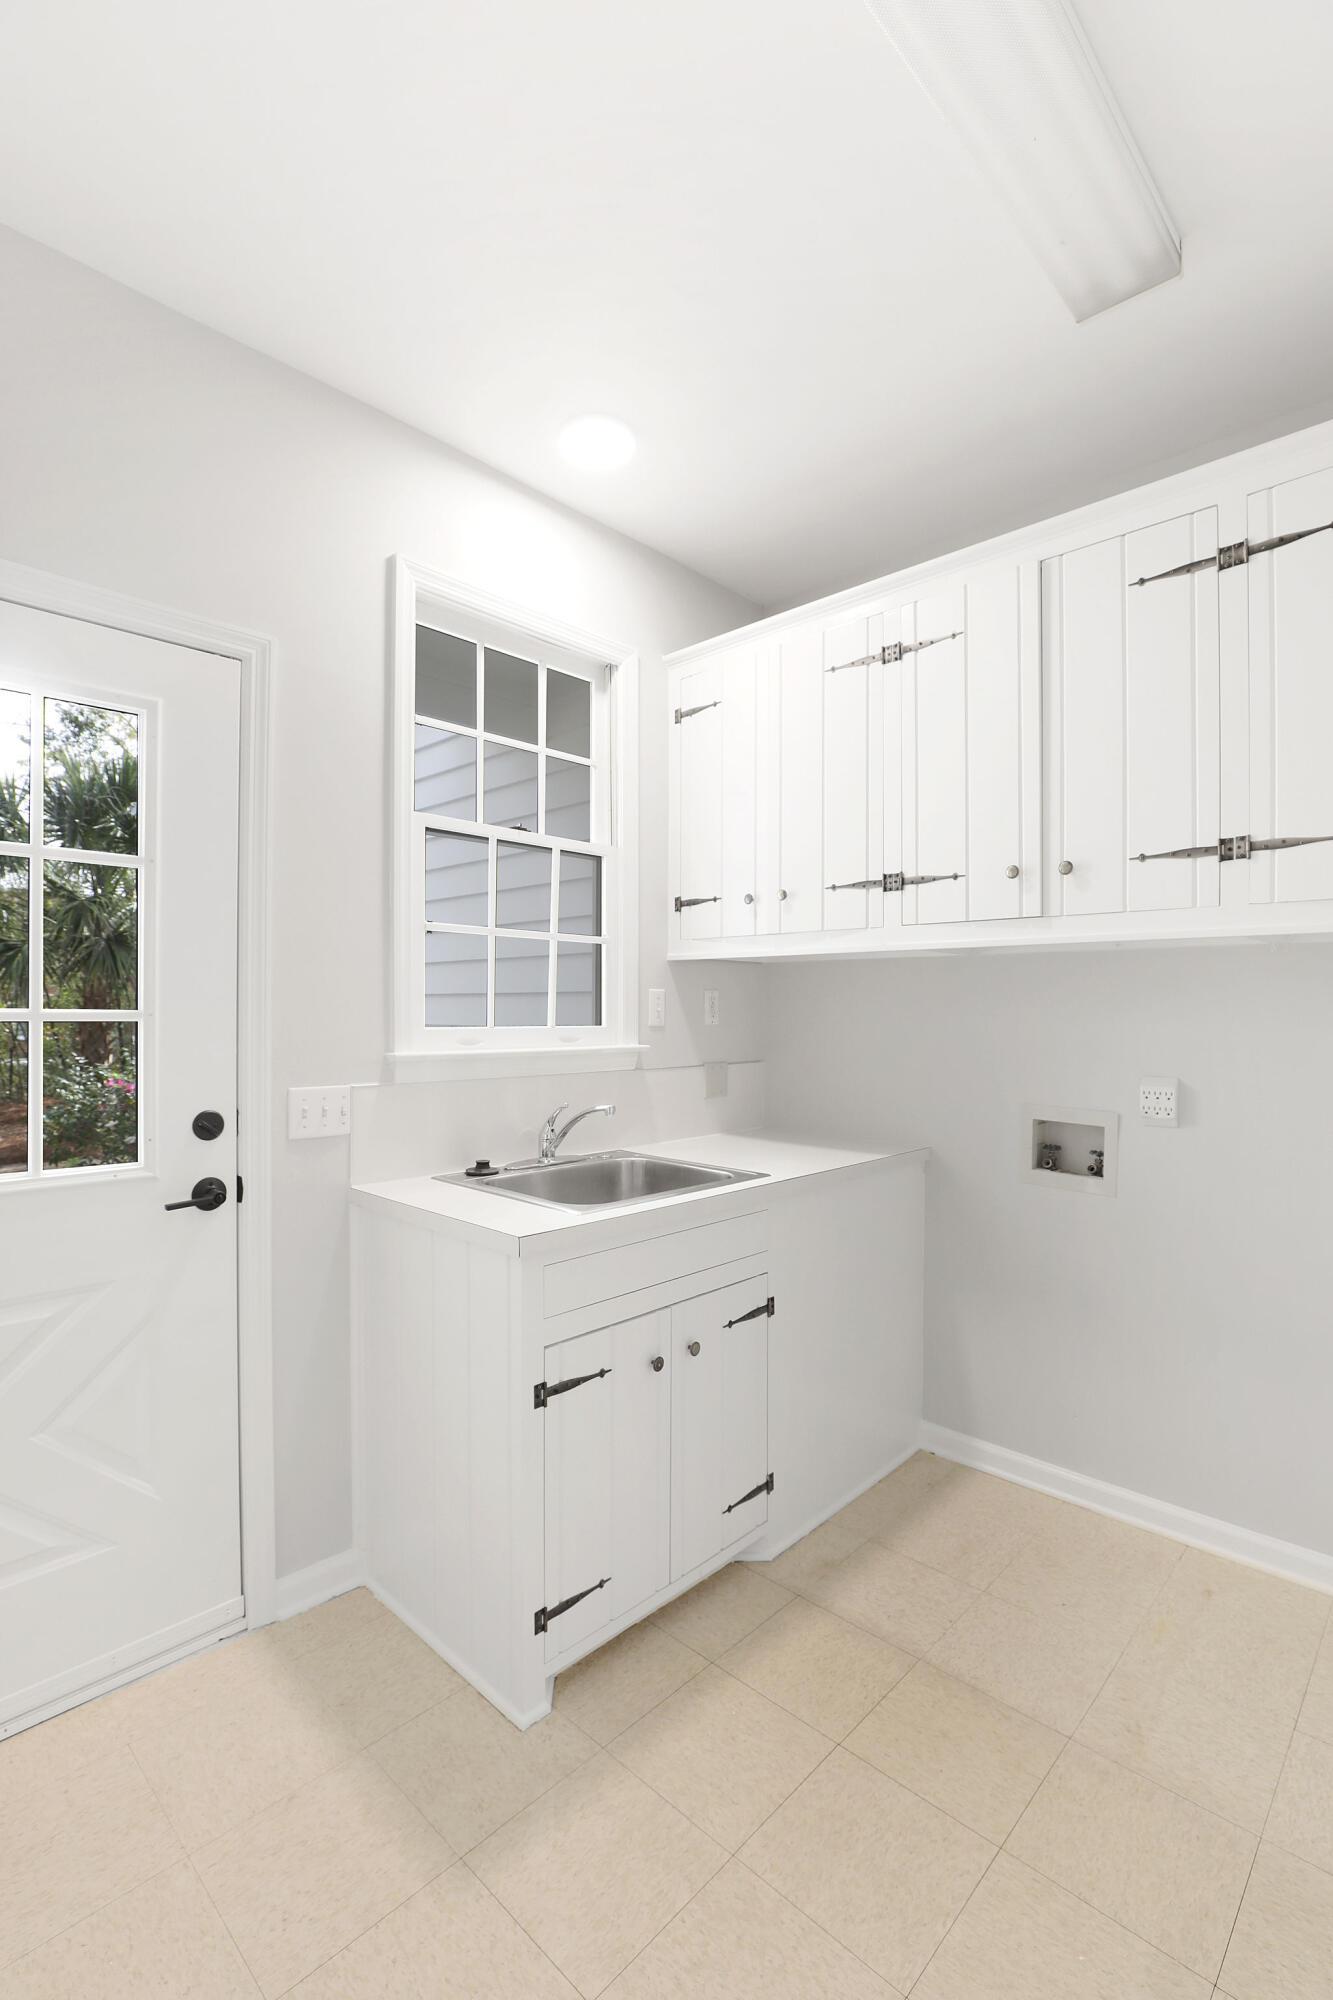 Old Mt Pleasant Homes For Sale - 1417 Edwards, Mount Pleasant, SC - 3